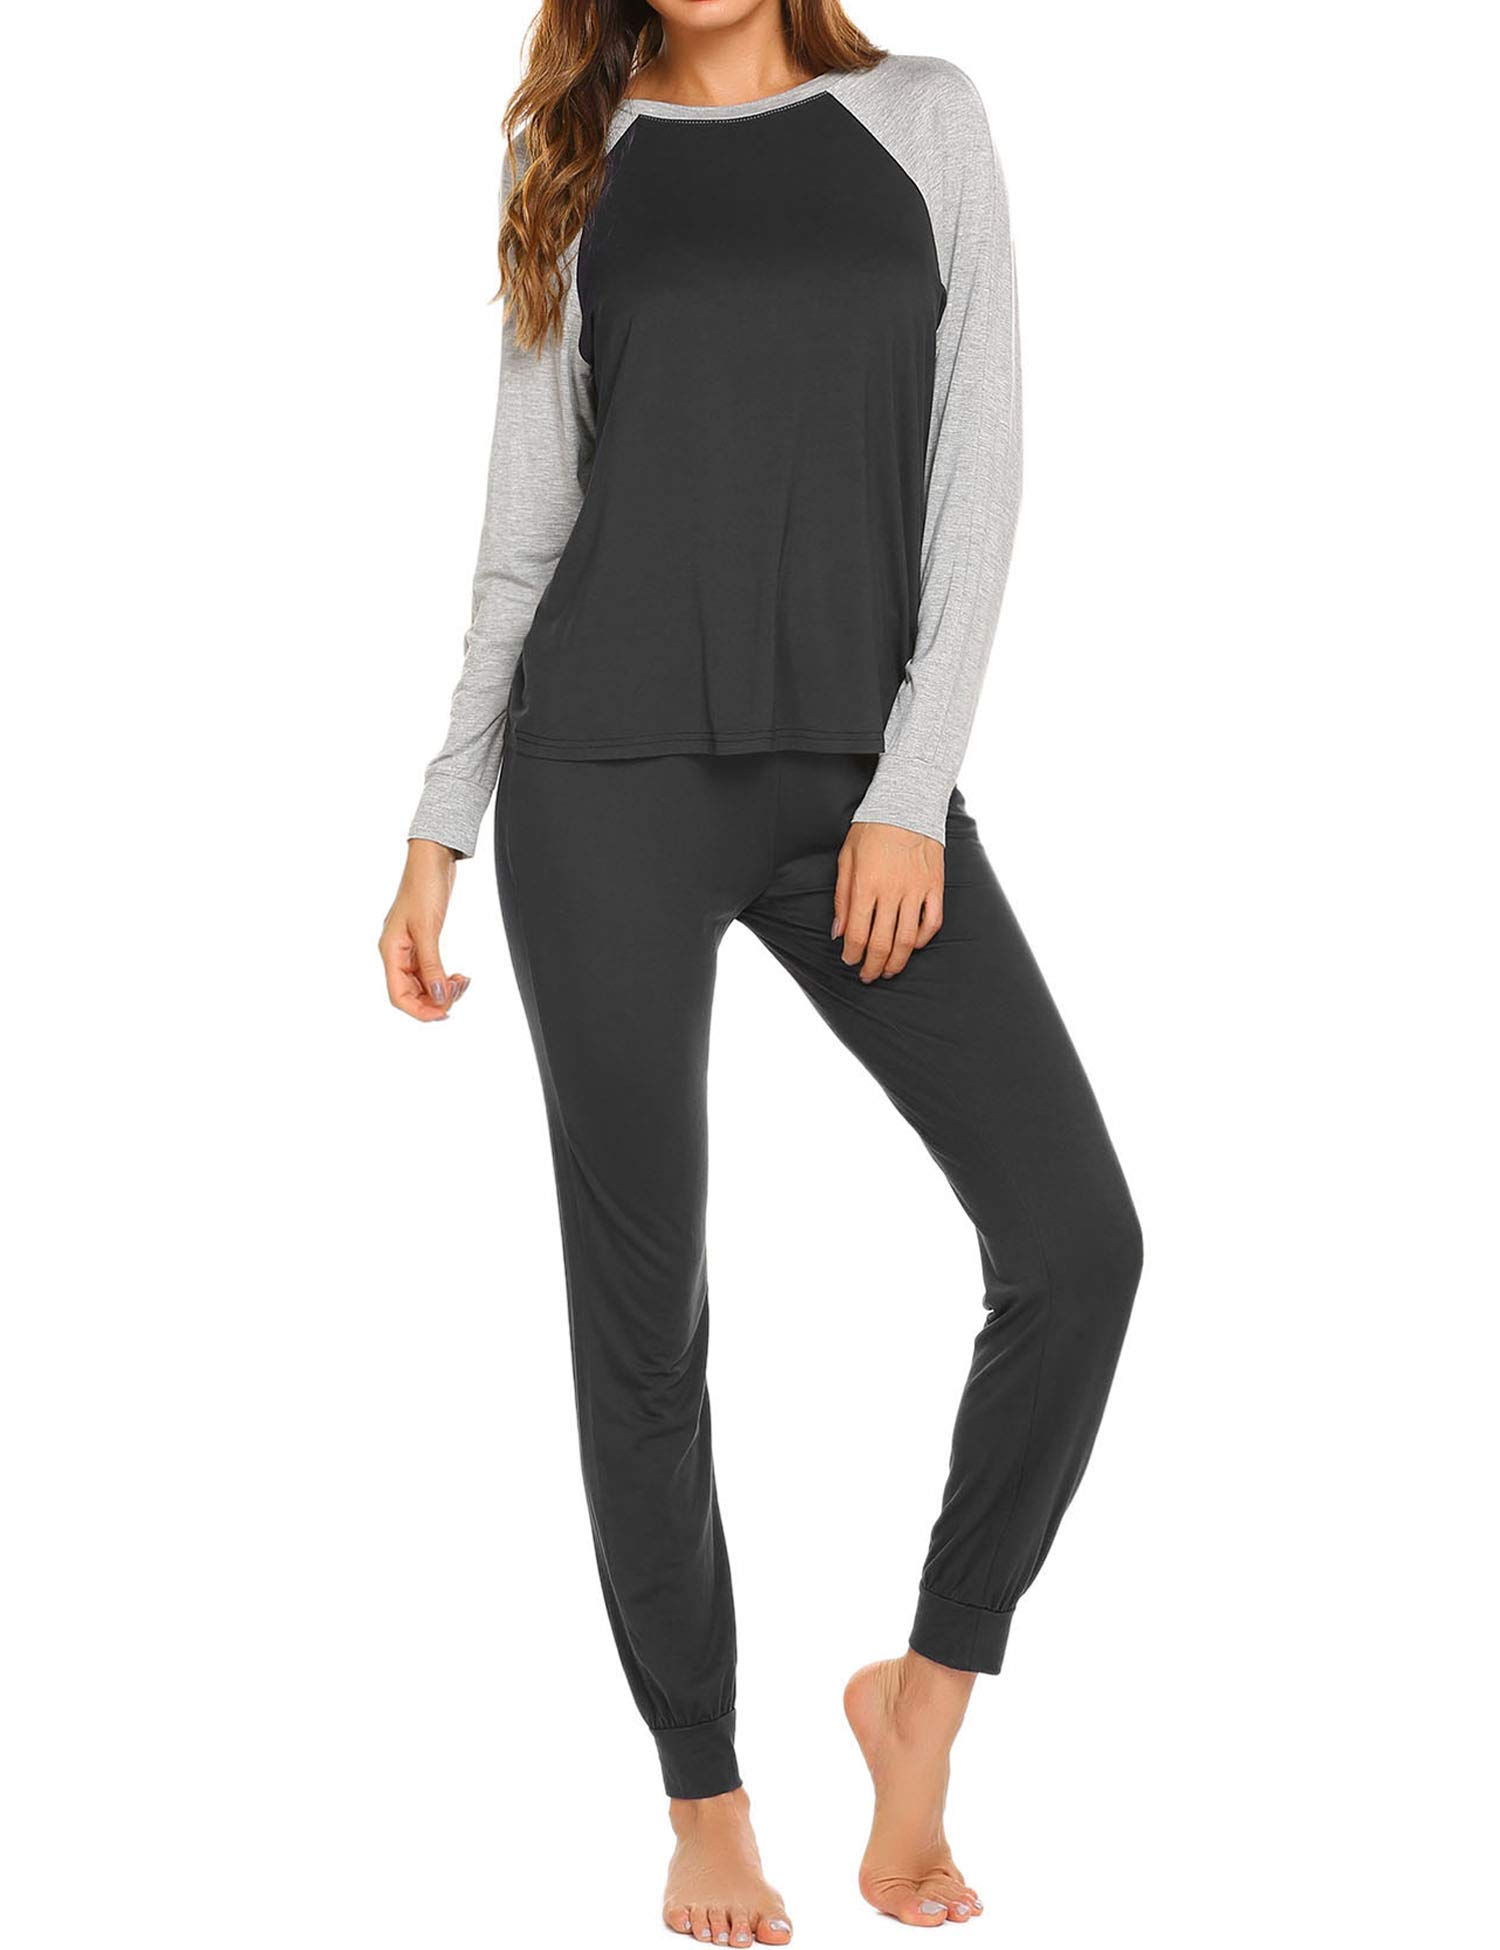 Ekouaer Pajamas Women's Long Sleeve Sleepwear Cotton Christmas Loungewear Pj Set S-XXL